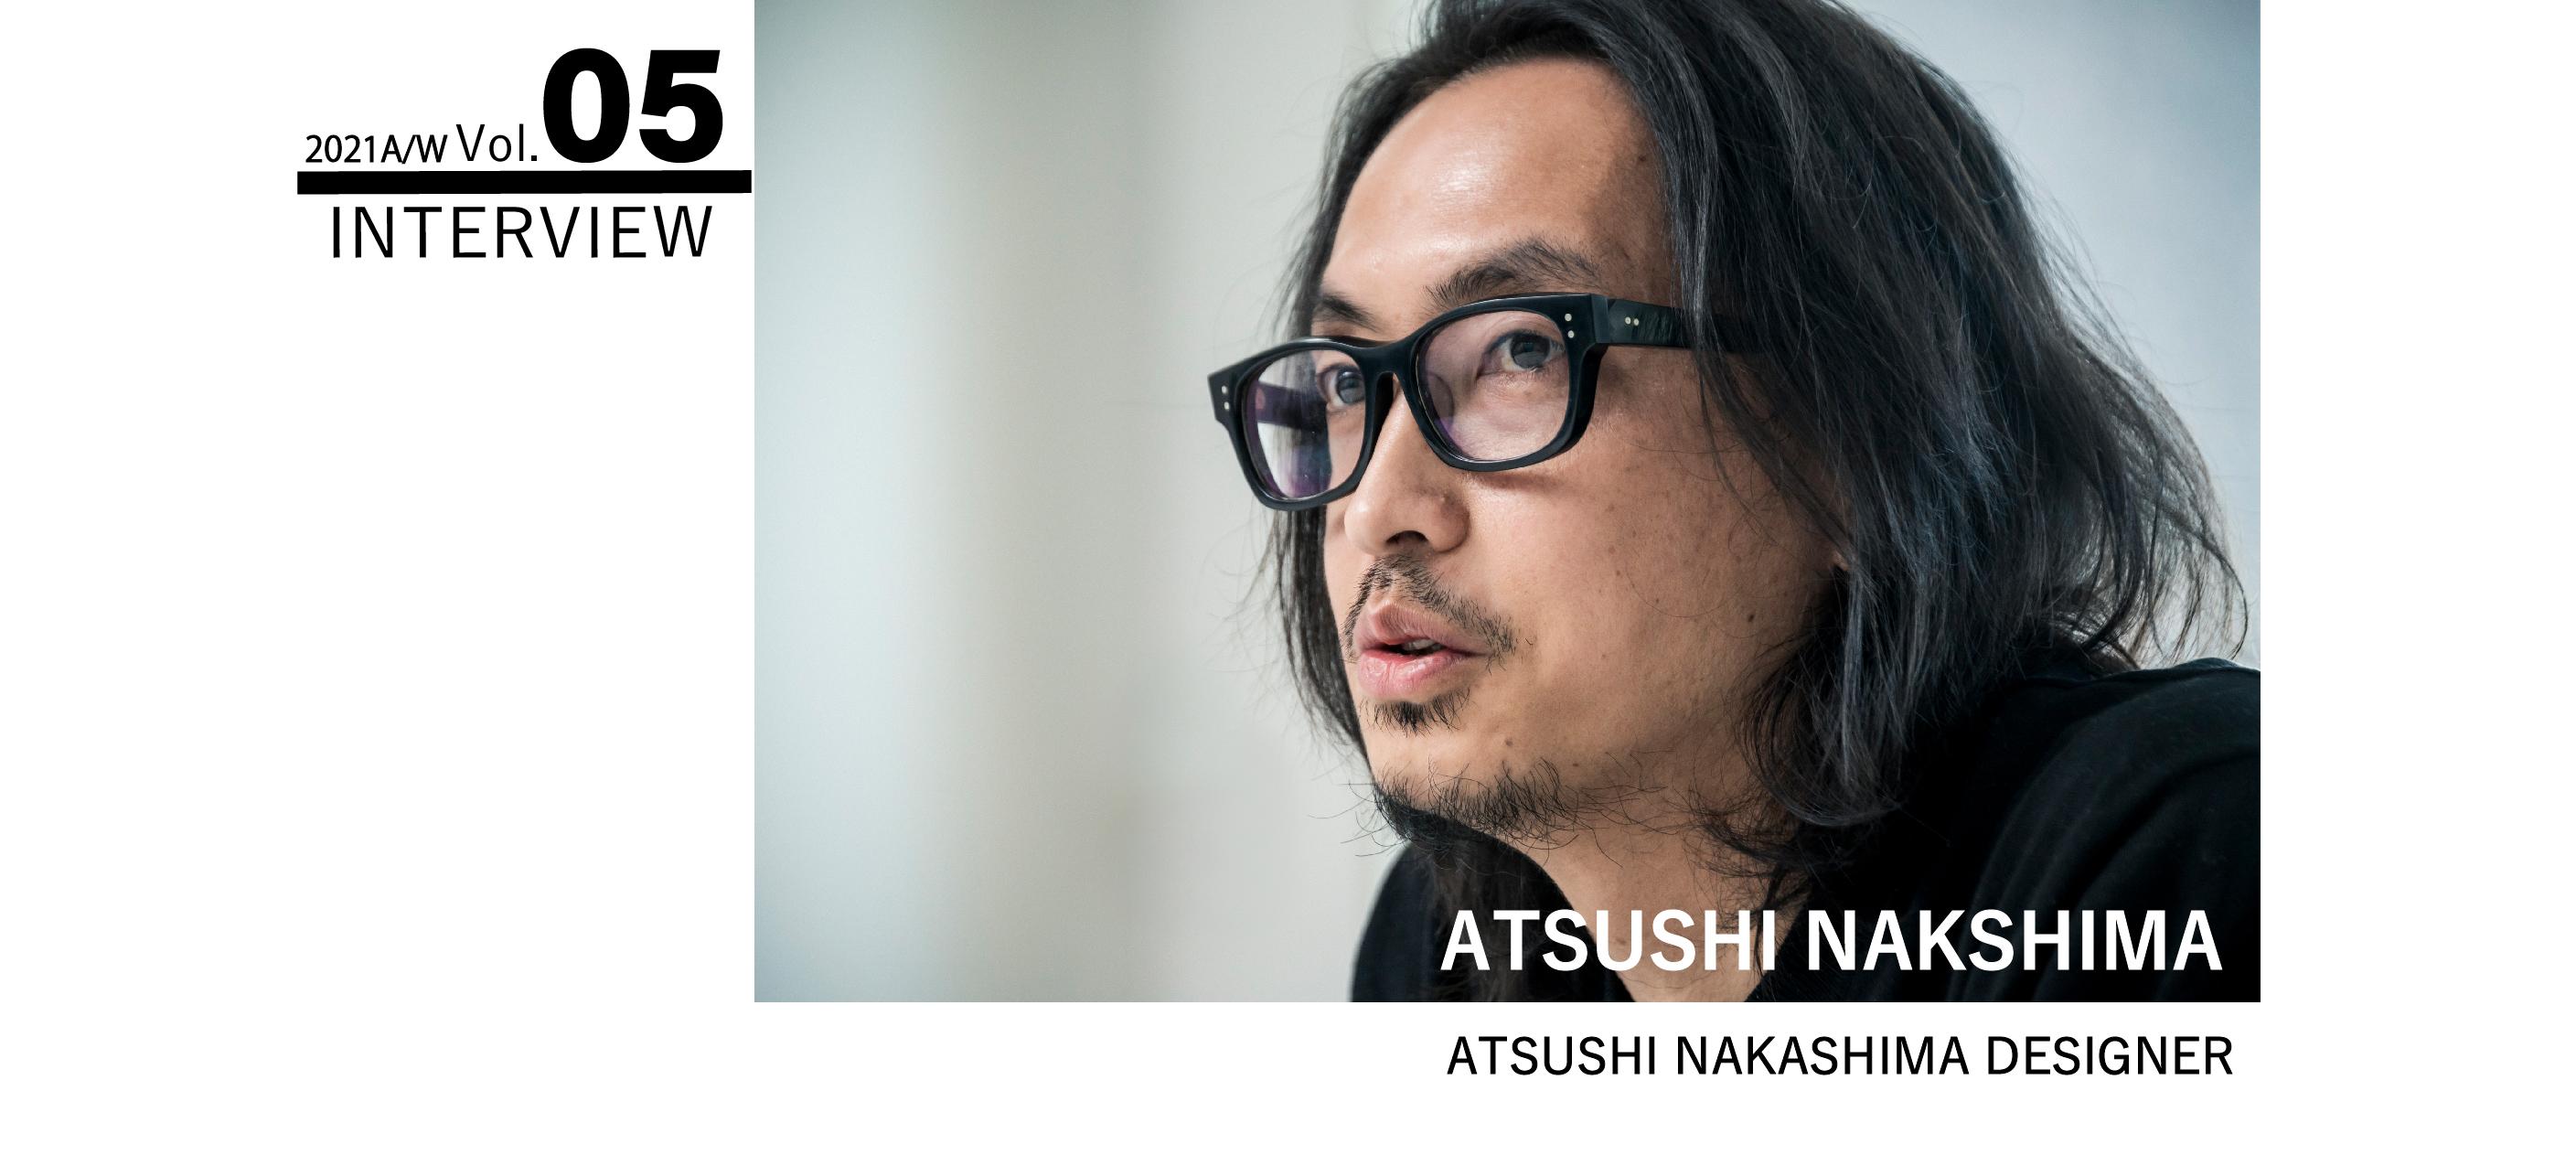 Atsushi Nakashima